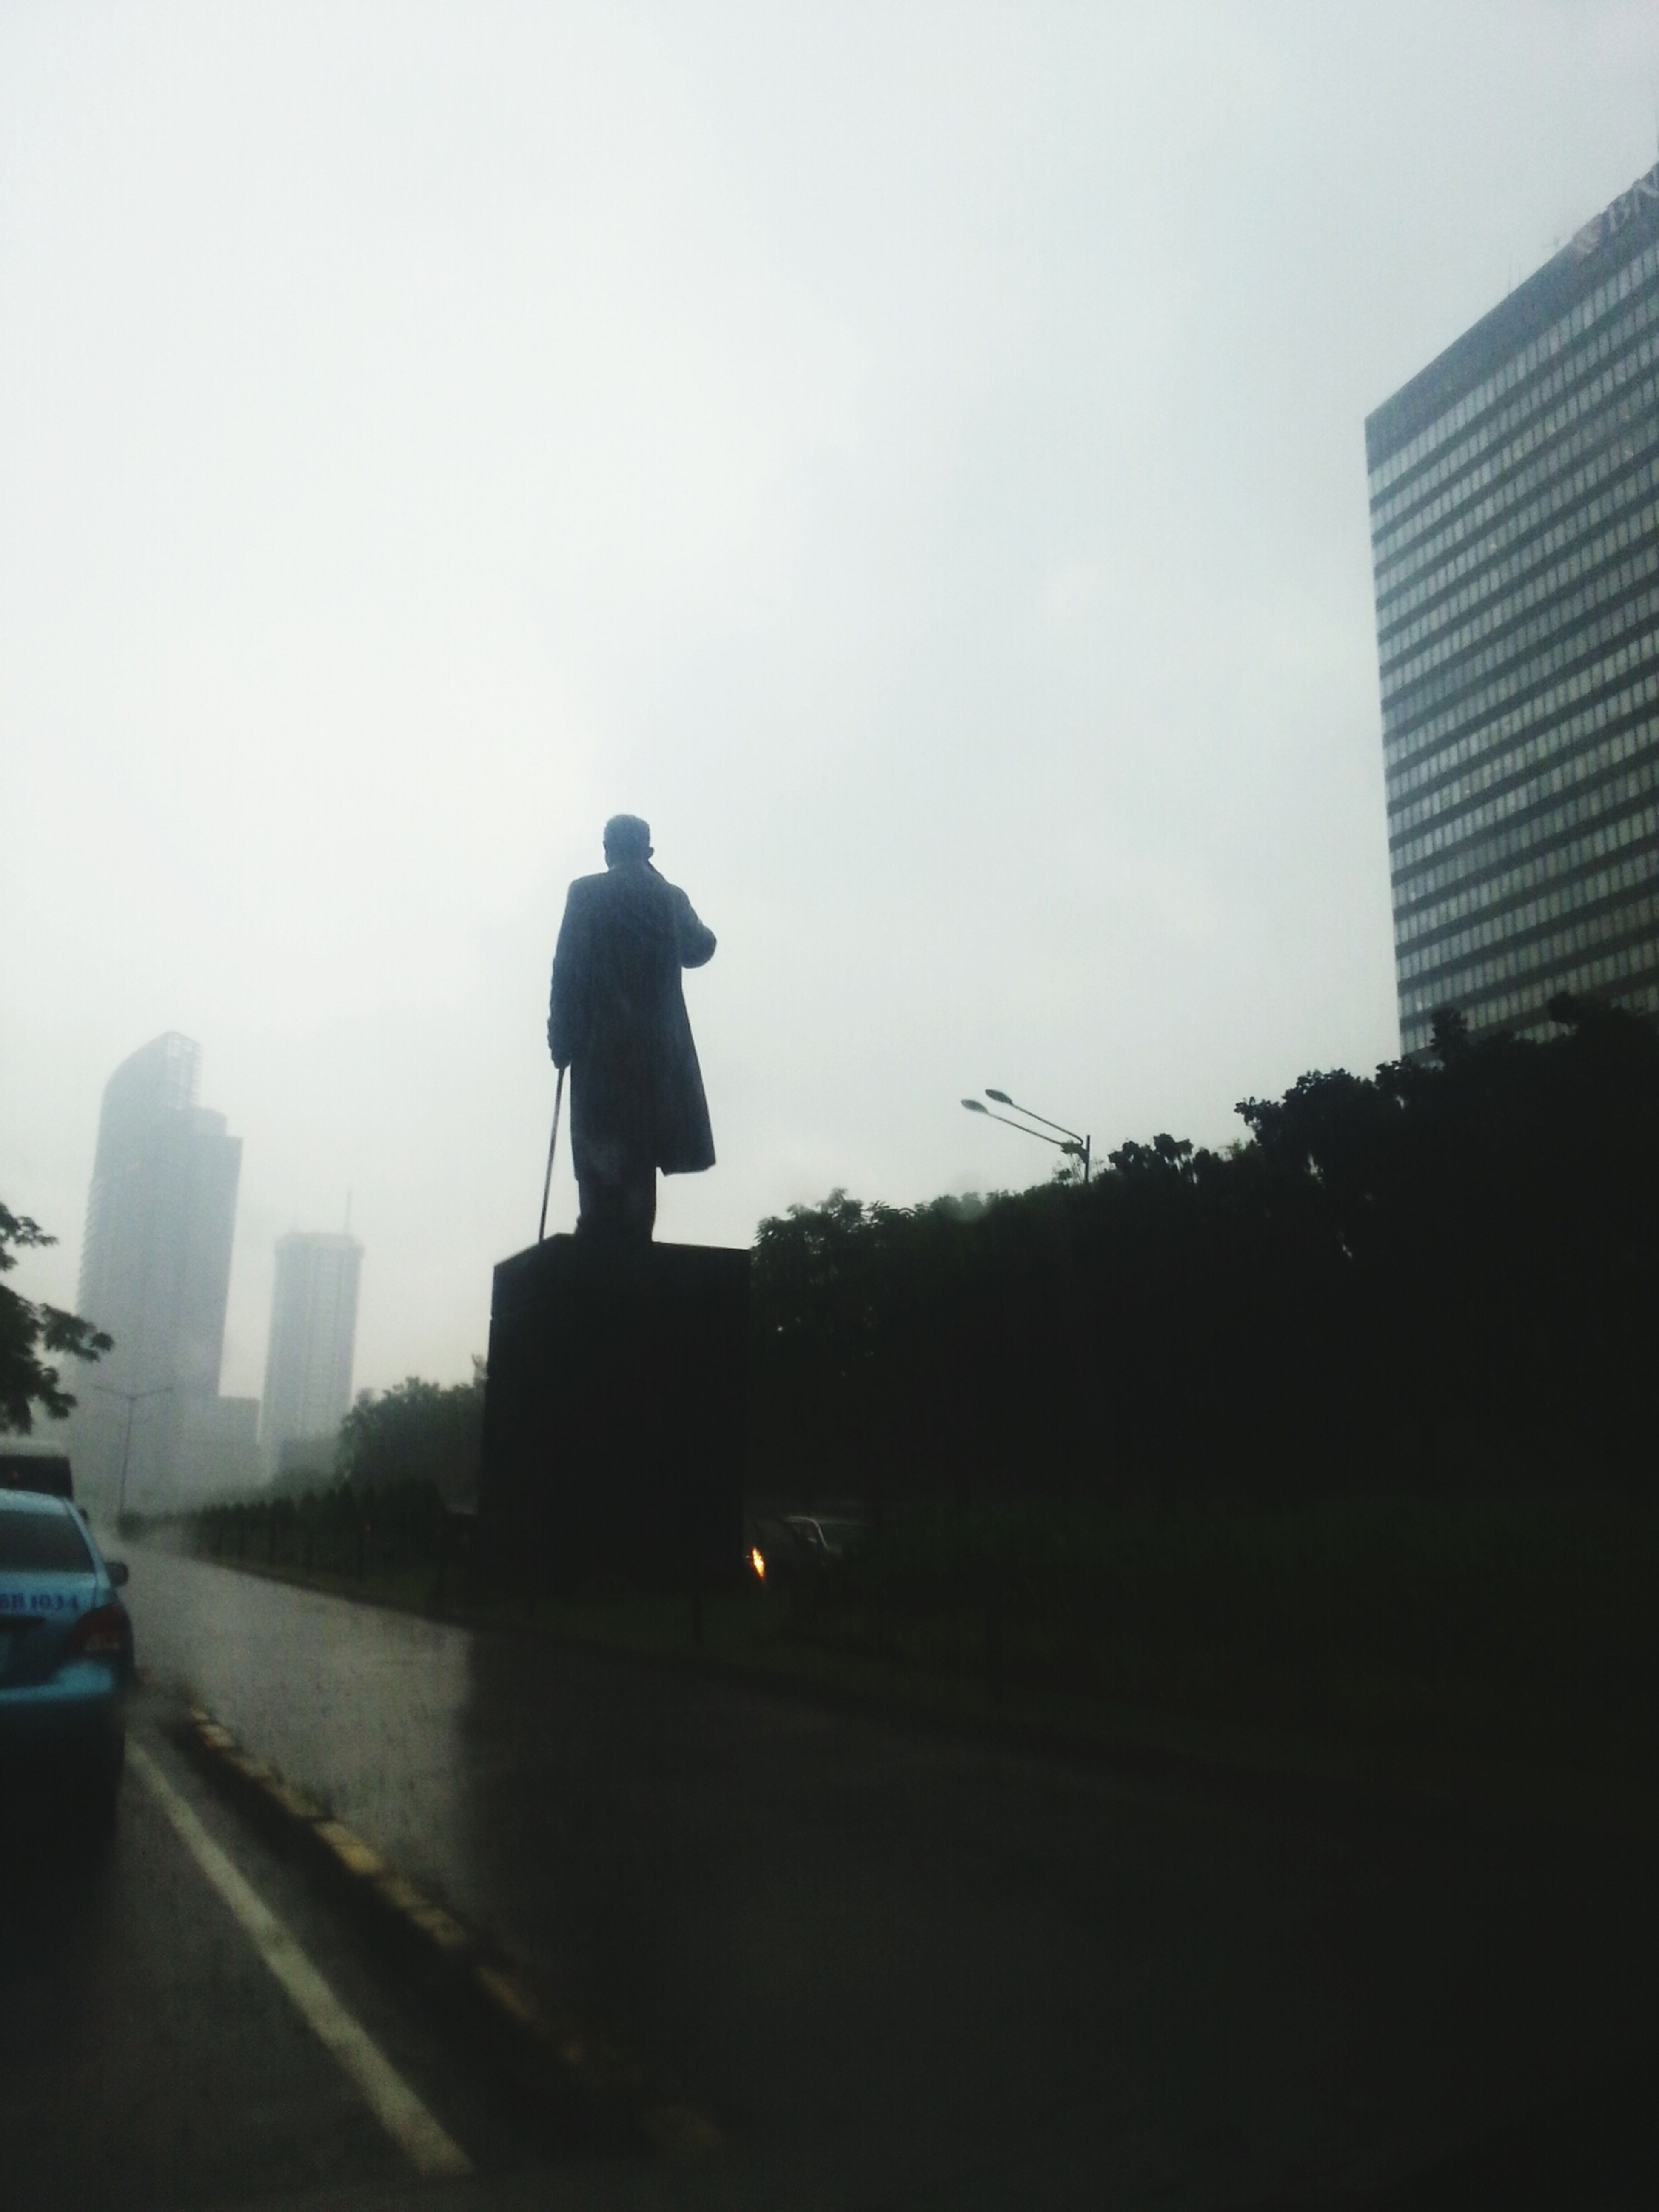 Jendral Sudirman Standstill in Heavy Rain Our Hero